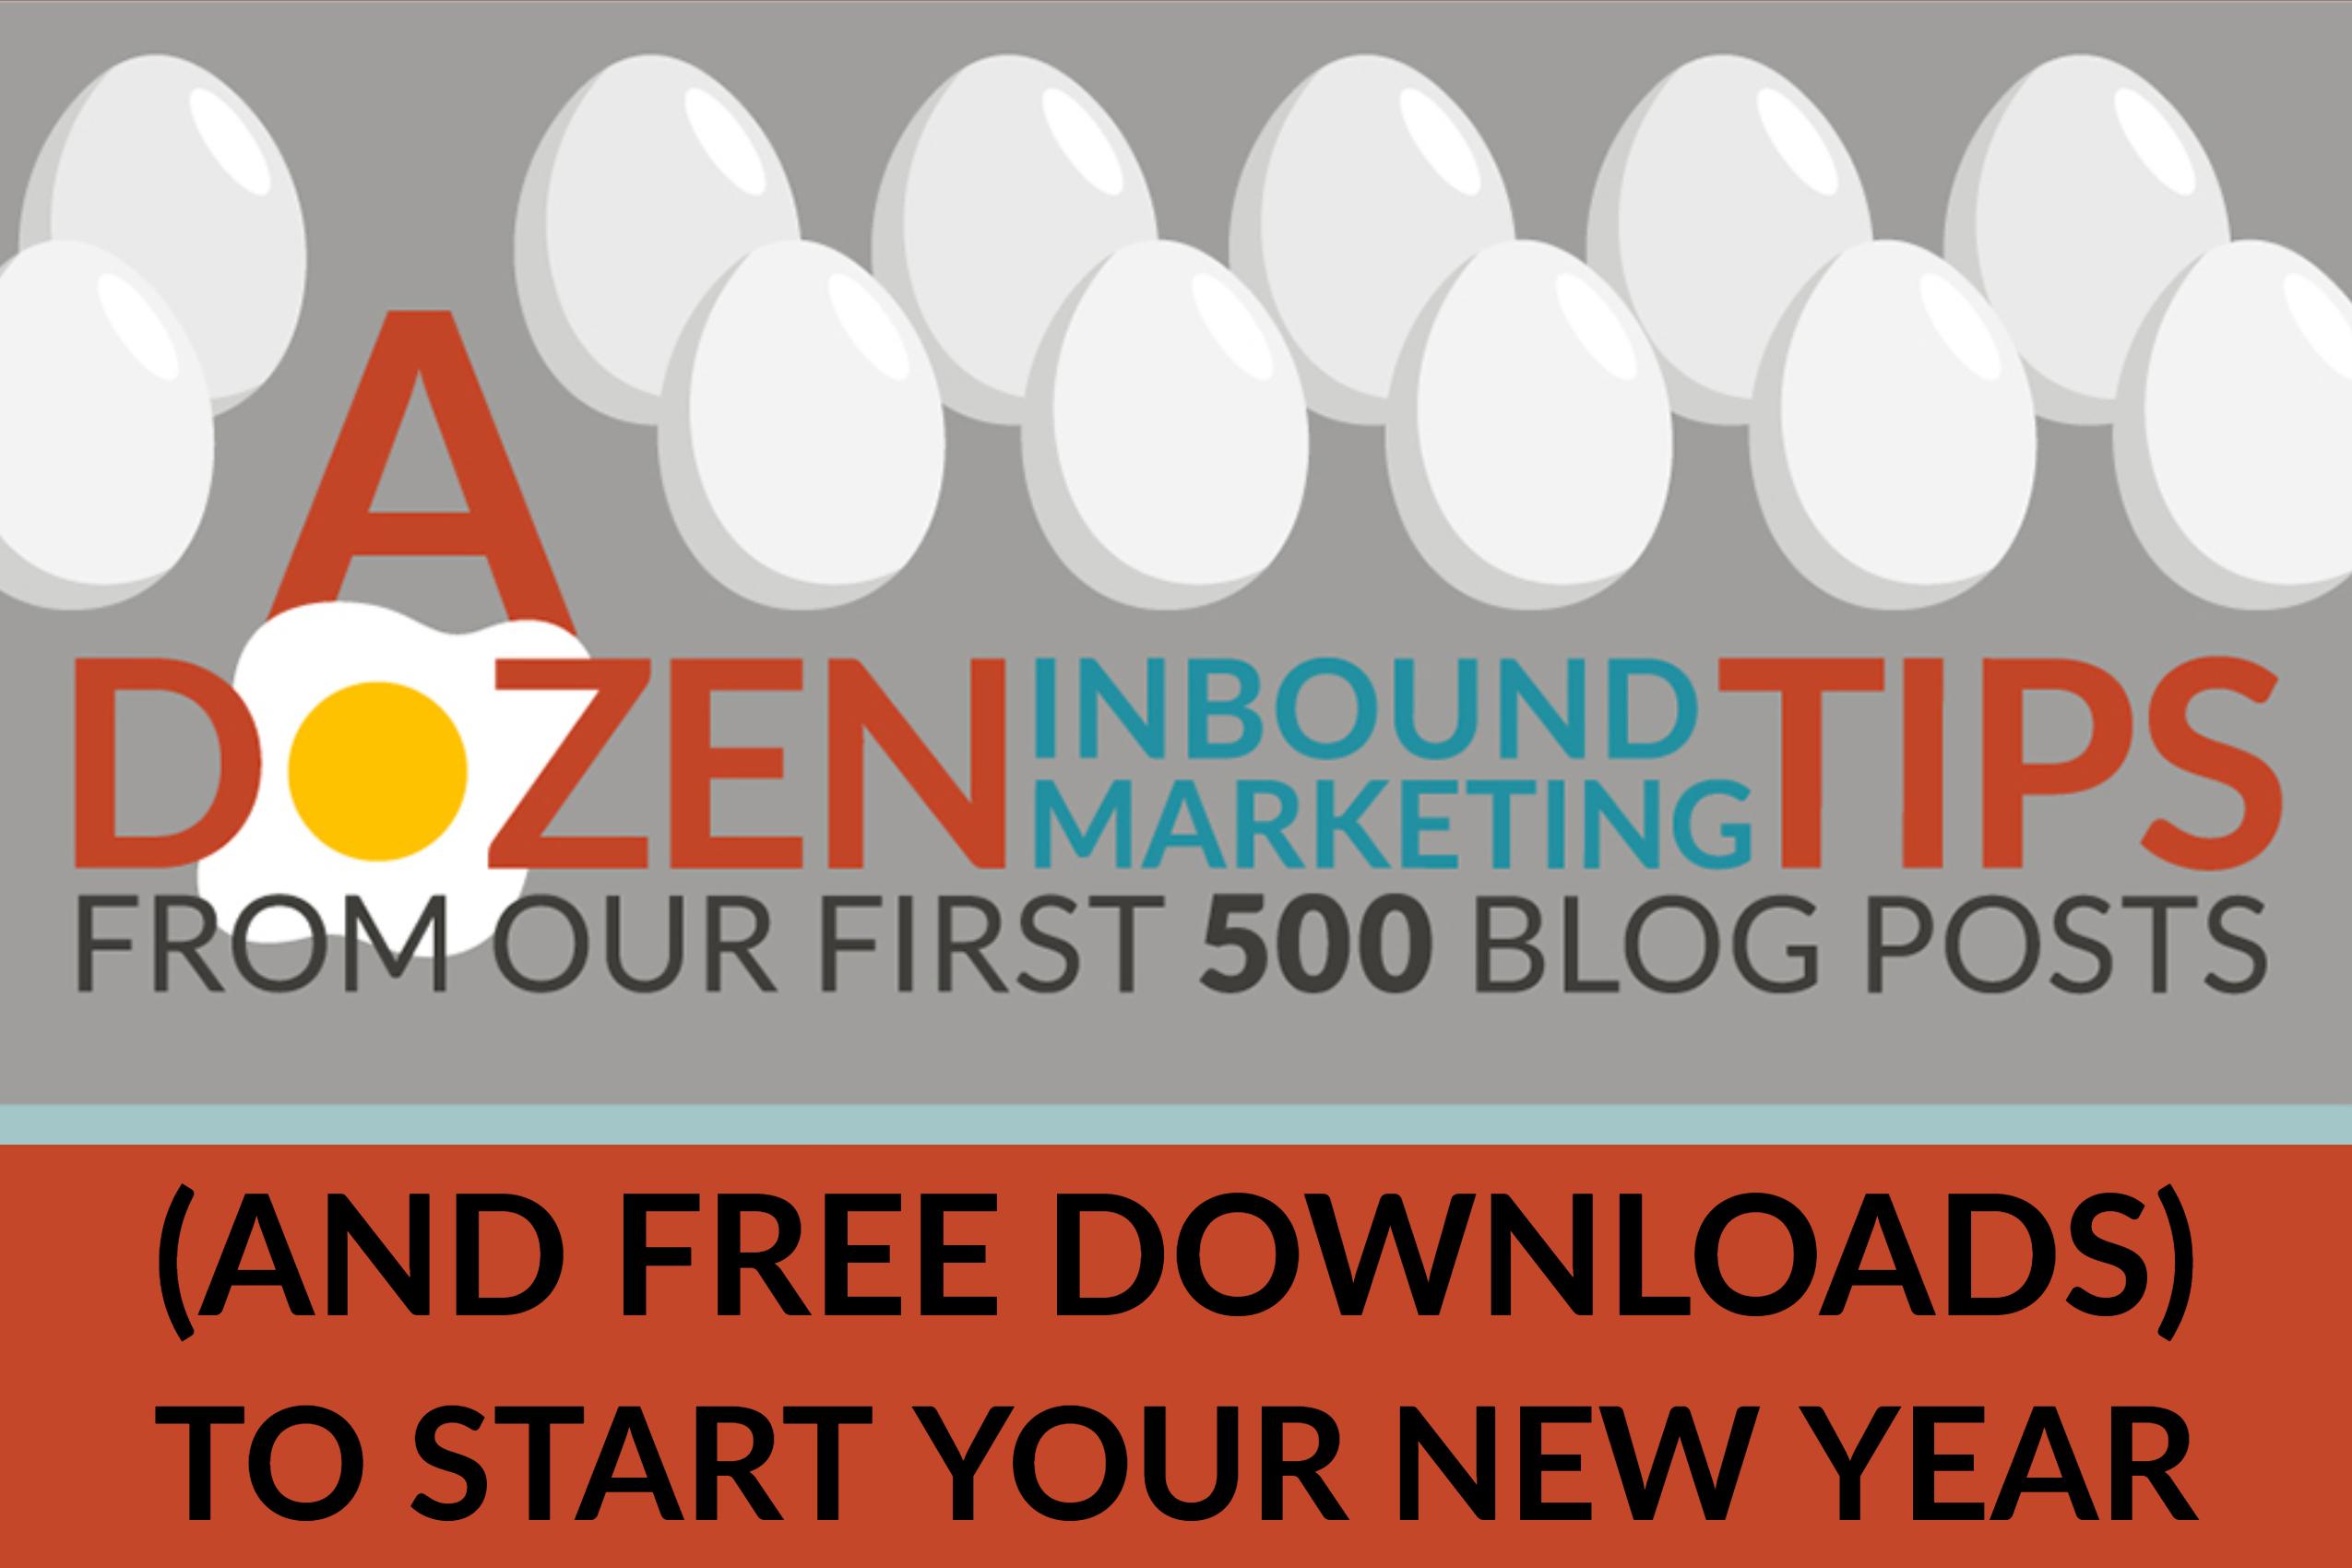 A Dozen Inbound Marketing Tips (And Free Downloads) To Start Your New Year